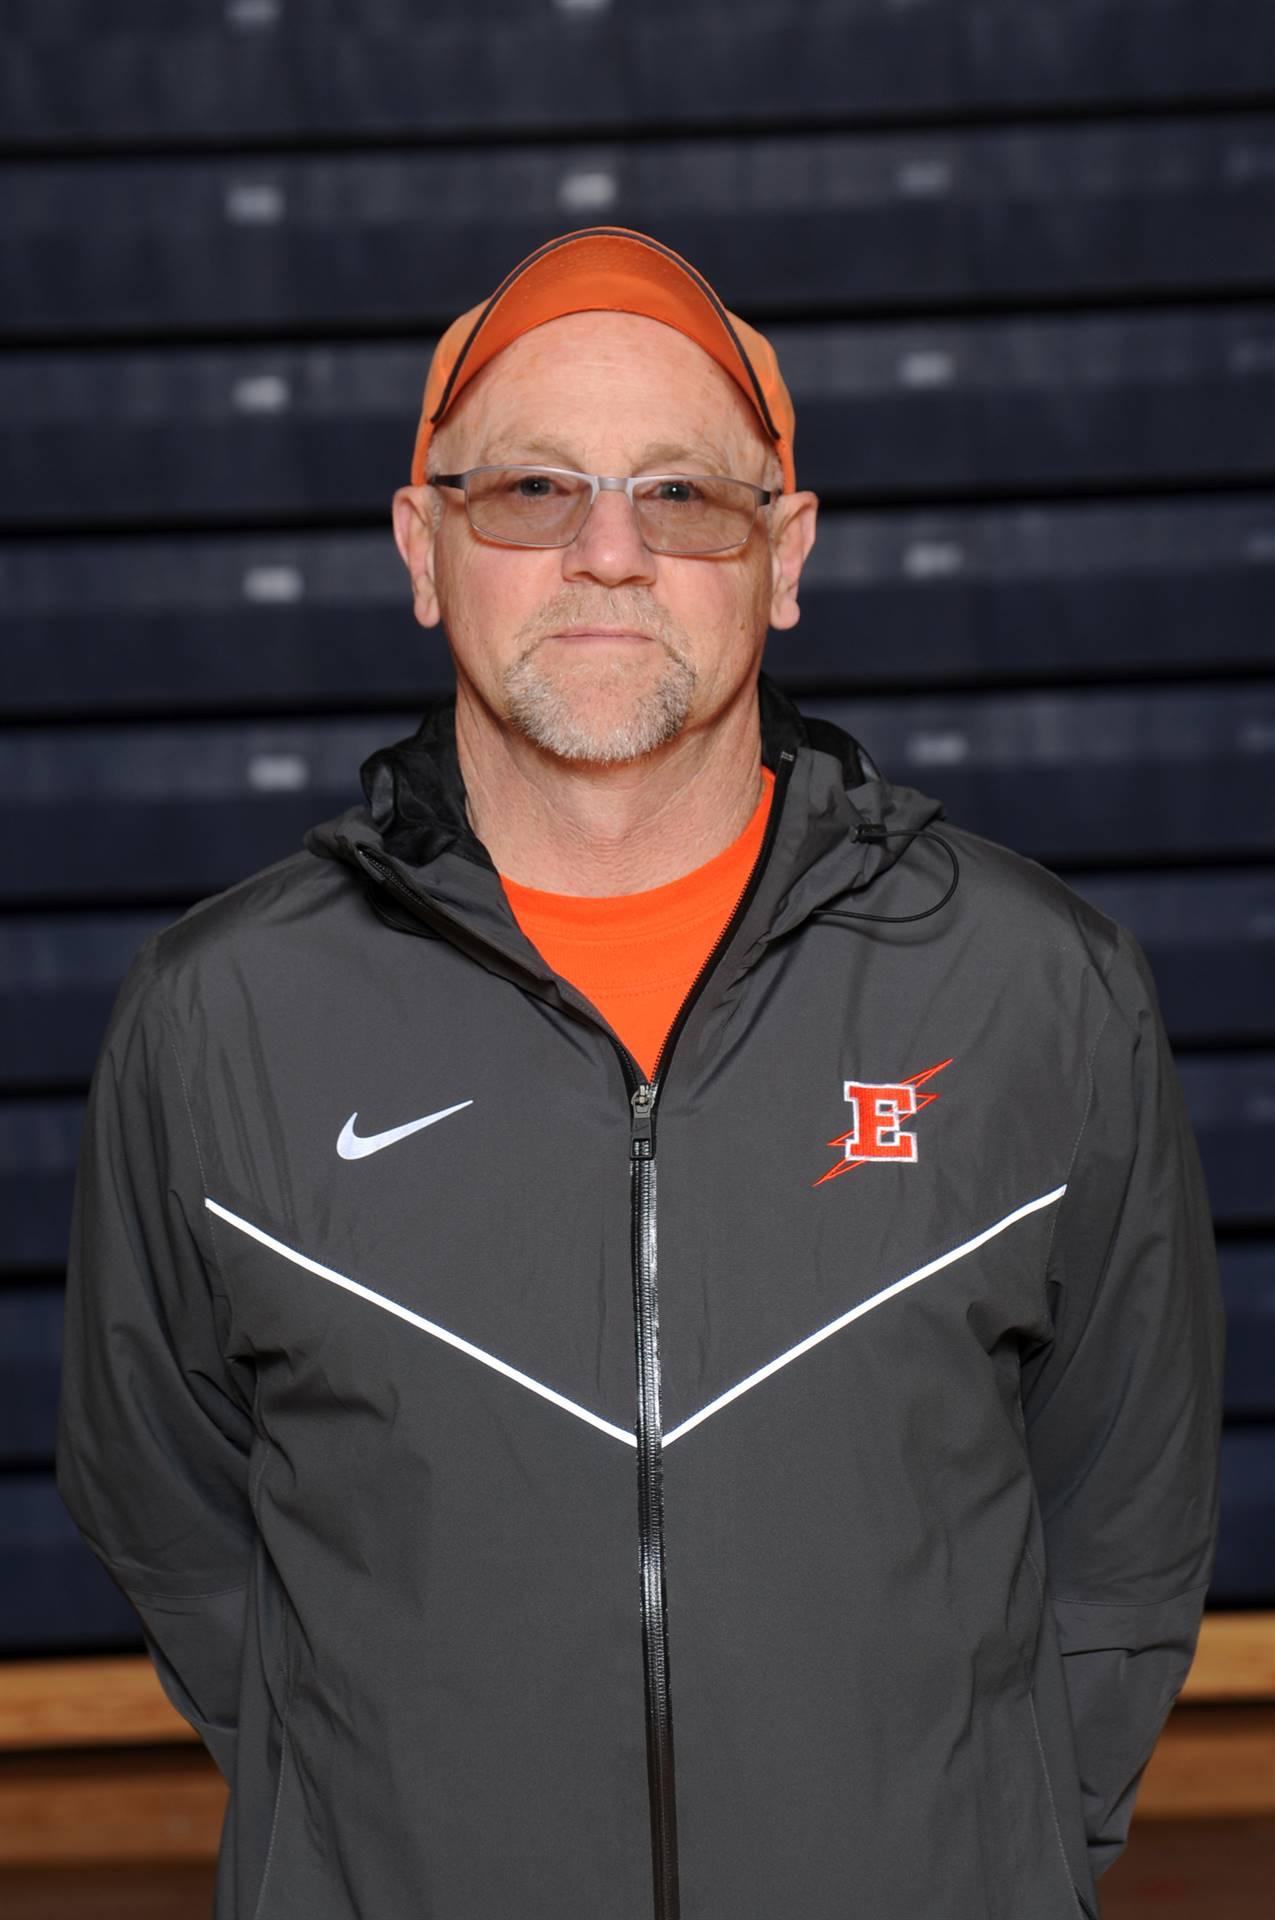 Head Boys Coach - Tim Campana